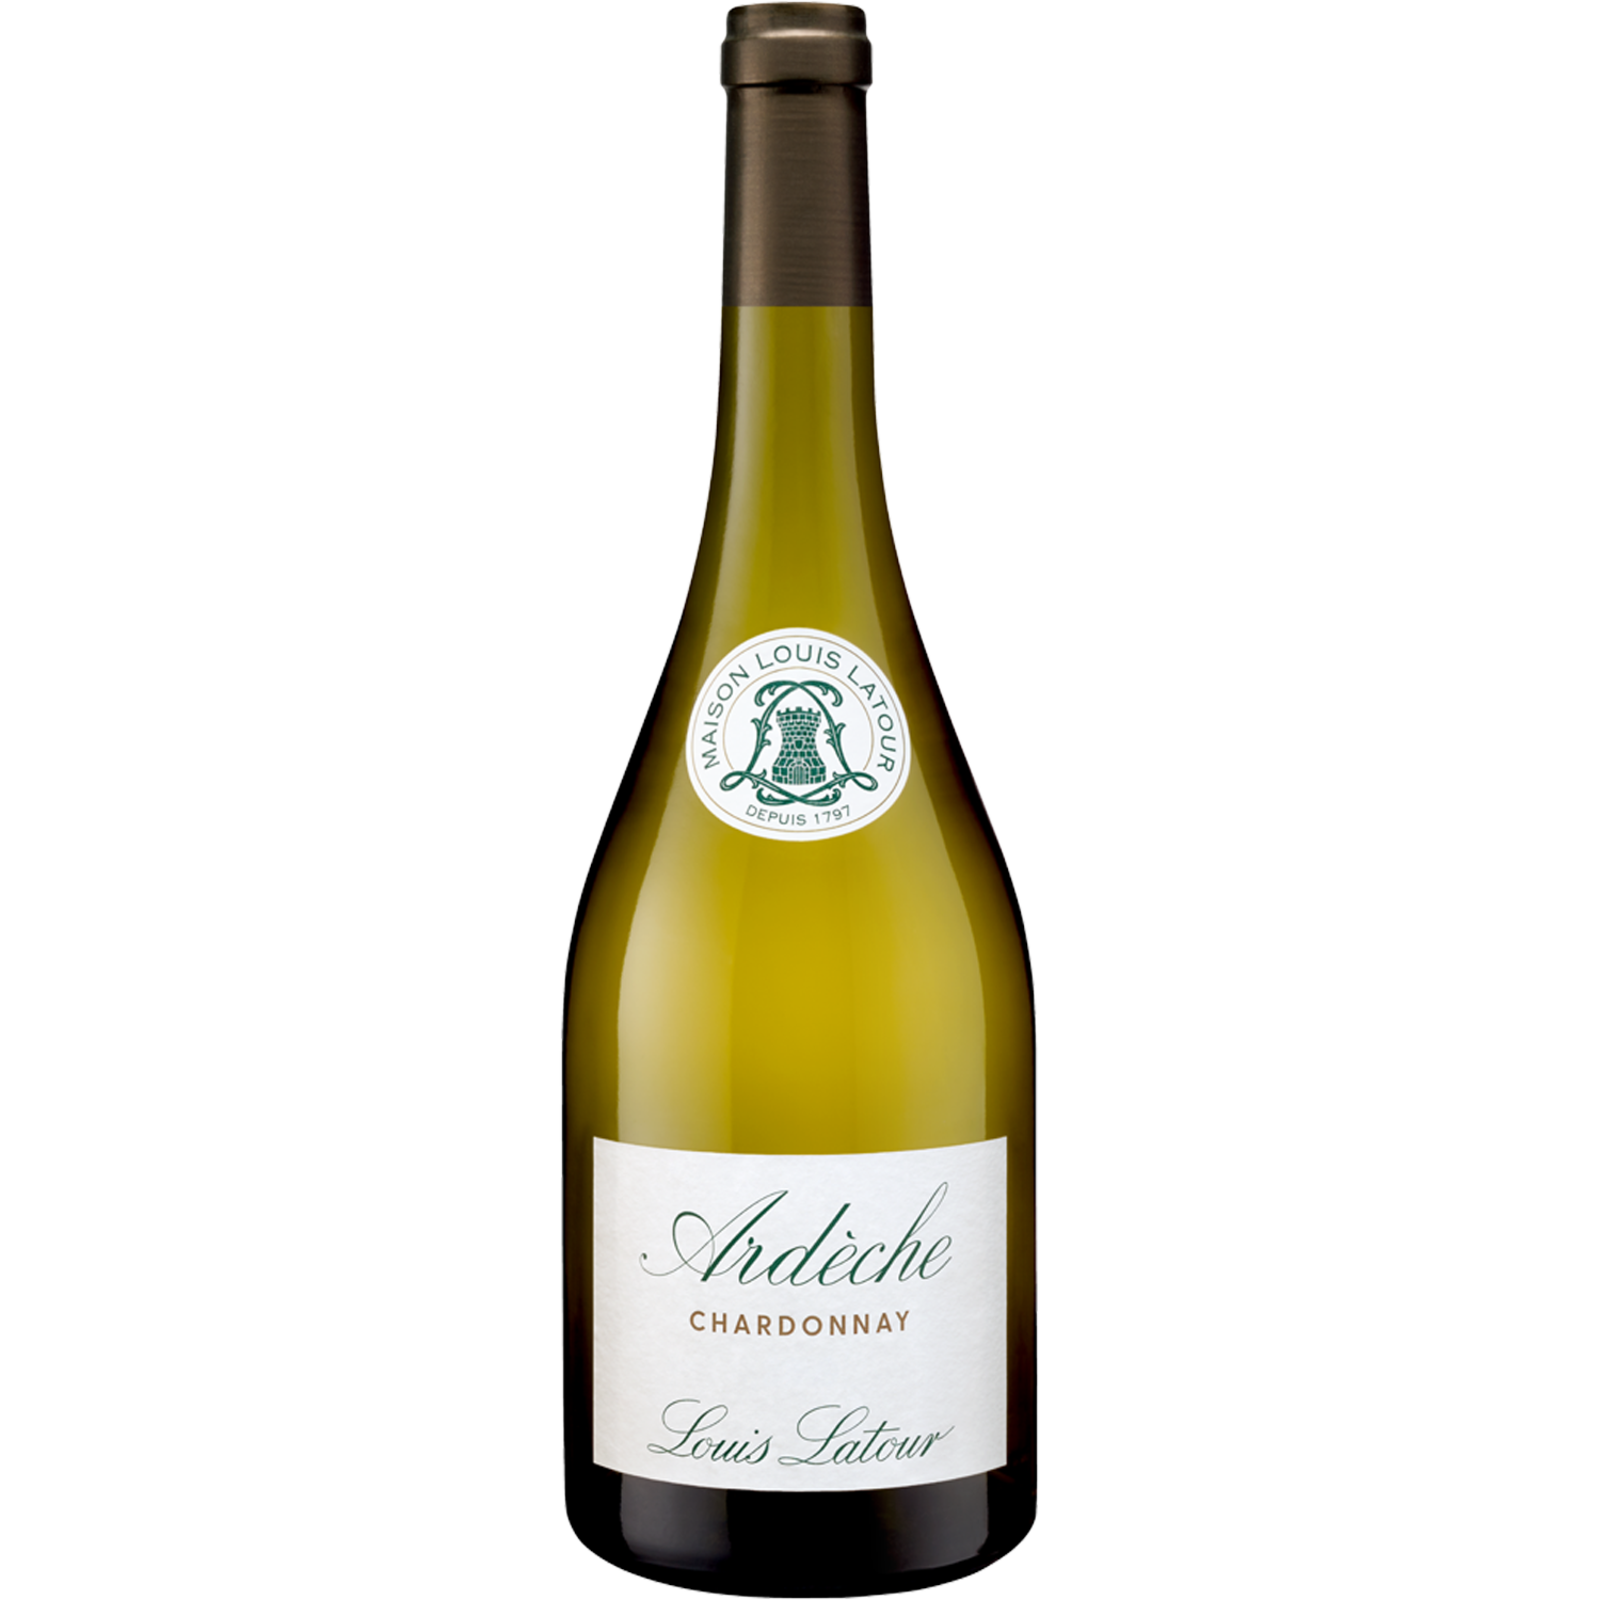 Louis Latour Louis Latour Ardèche Chardonnay 2018